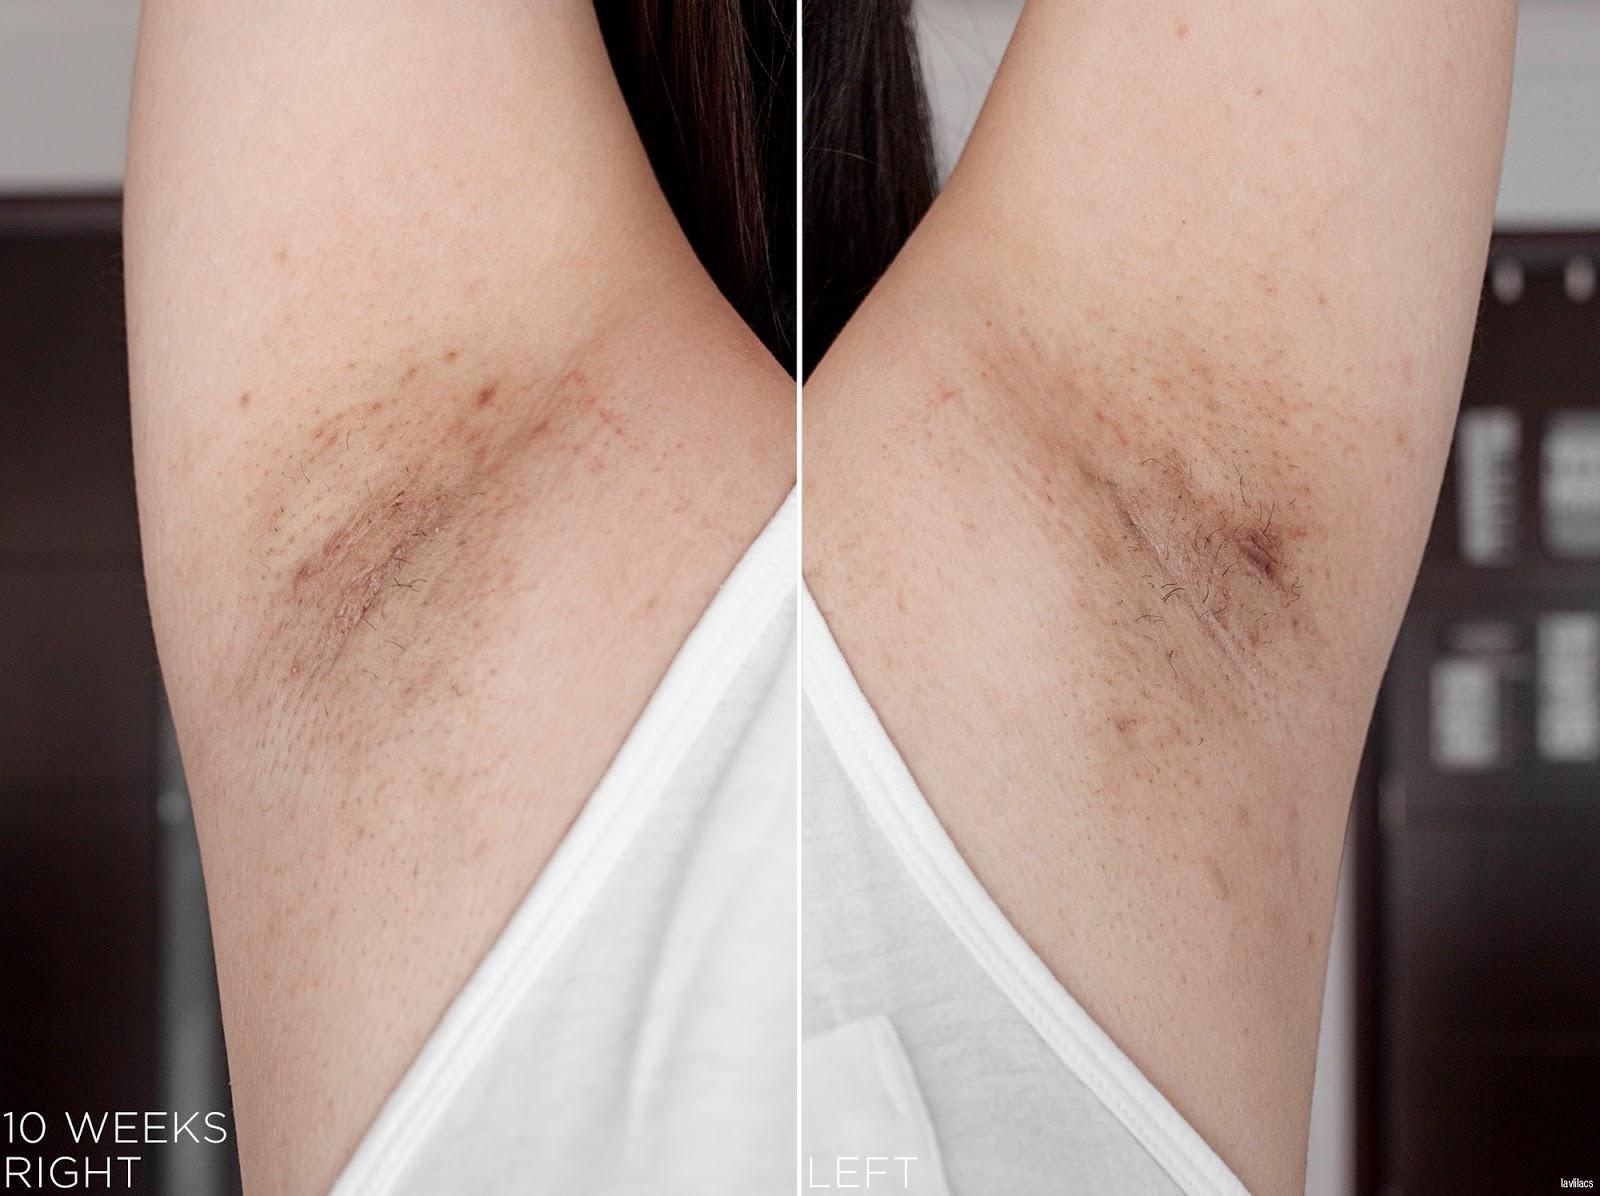 tria Hair Removal Laser Armpits Hair 10 Weeks, 2 months